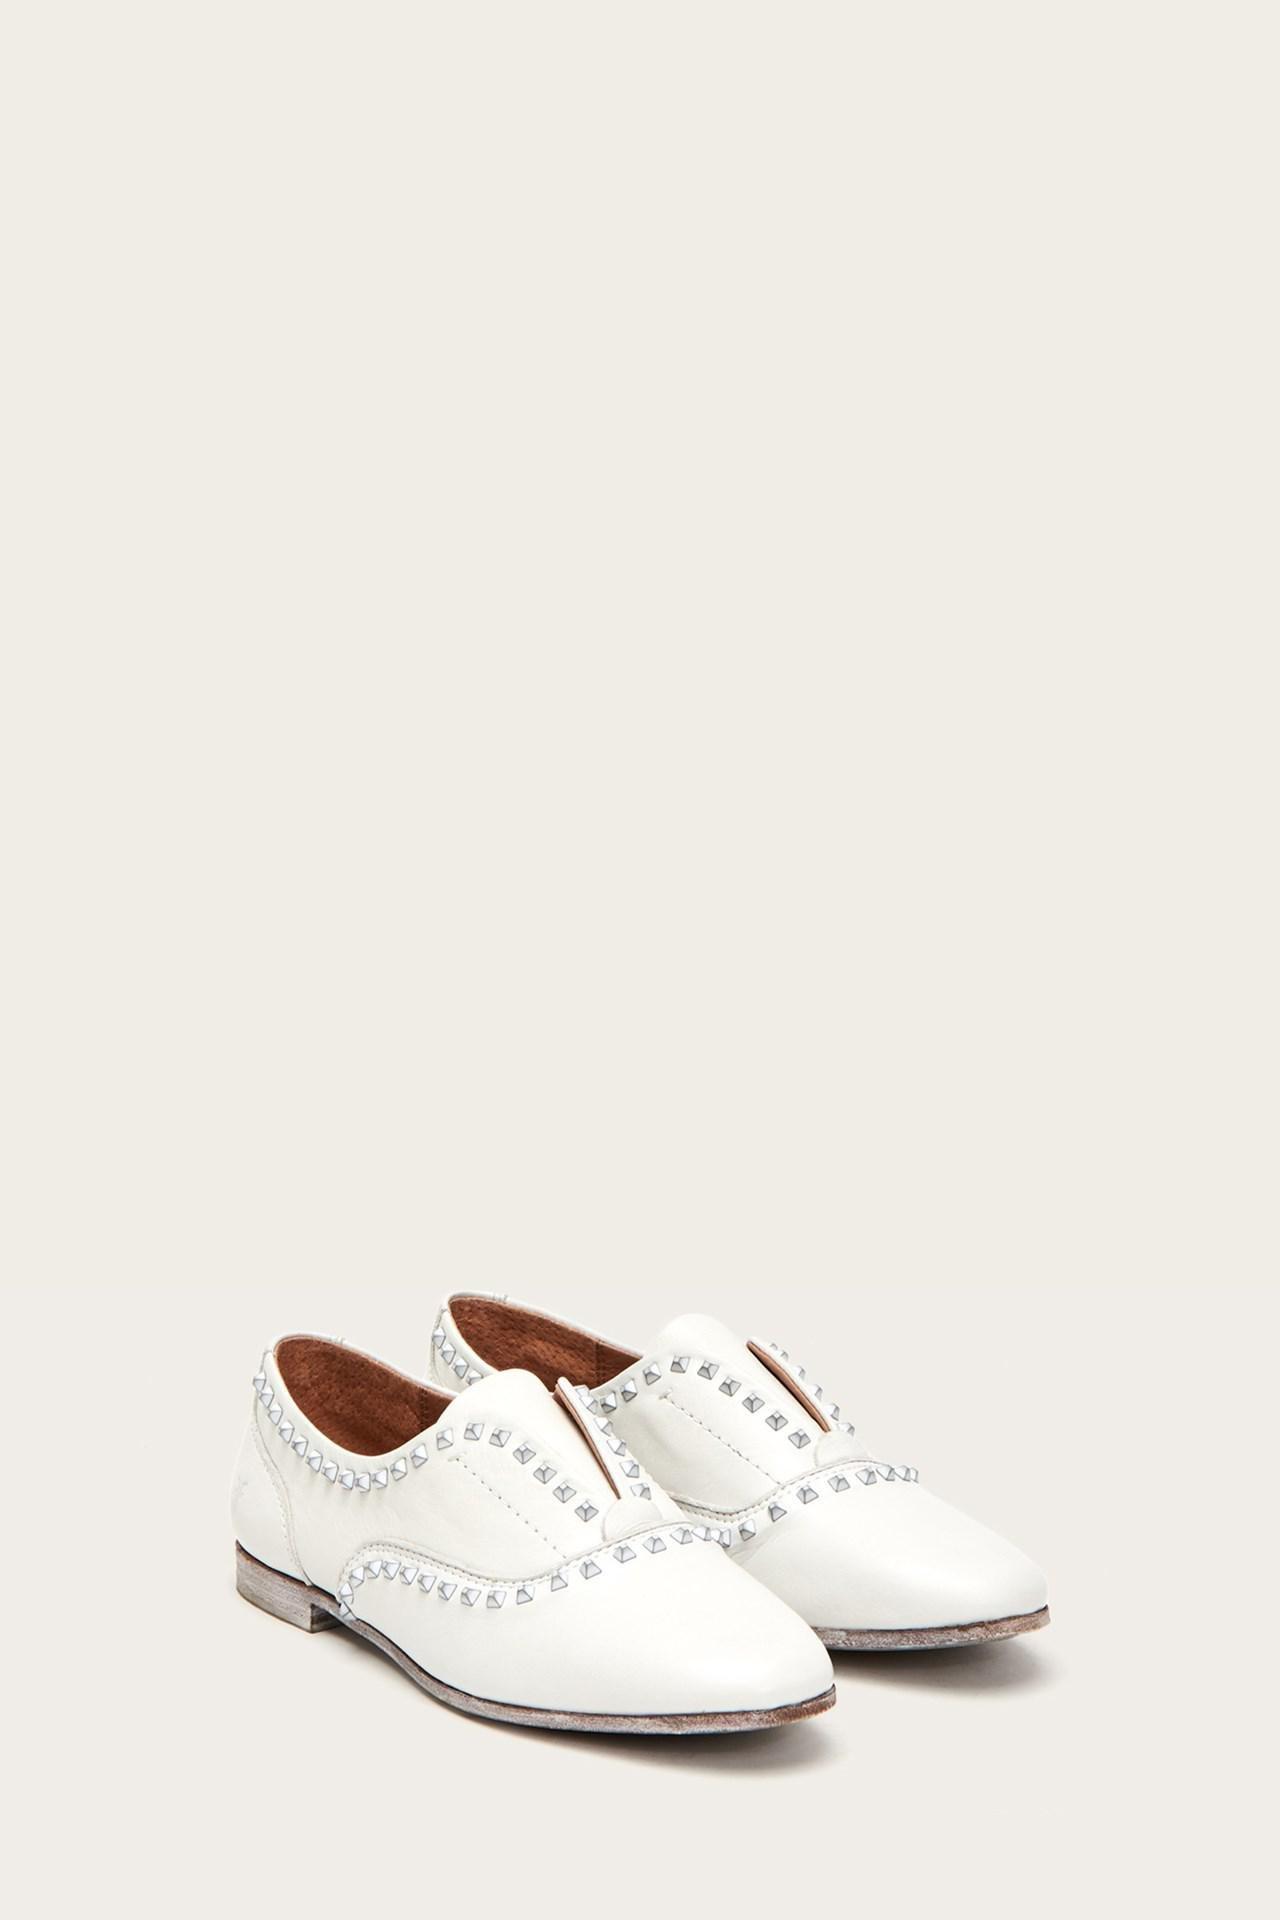 ca9f10175a6 Lyst - Frye Terri Deco Stud Slip On in White